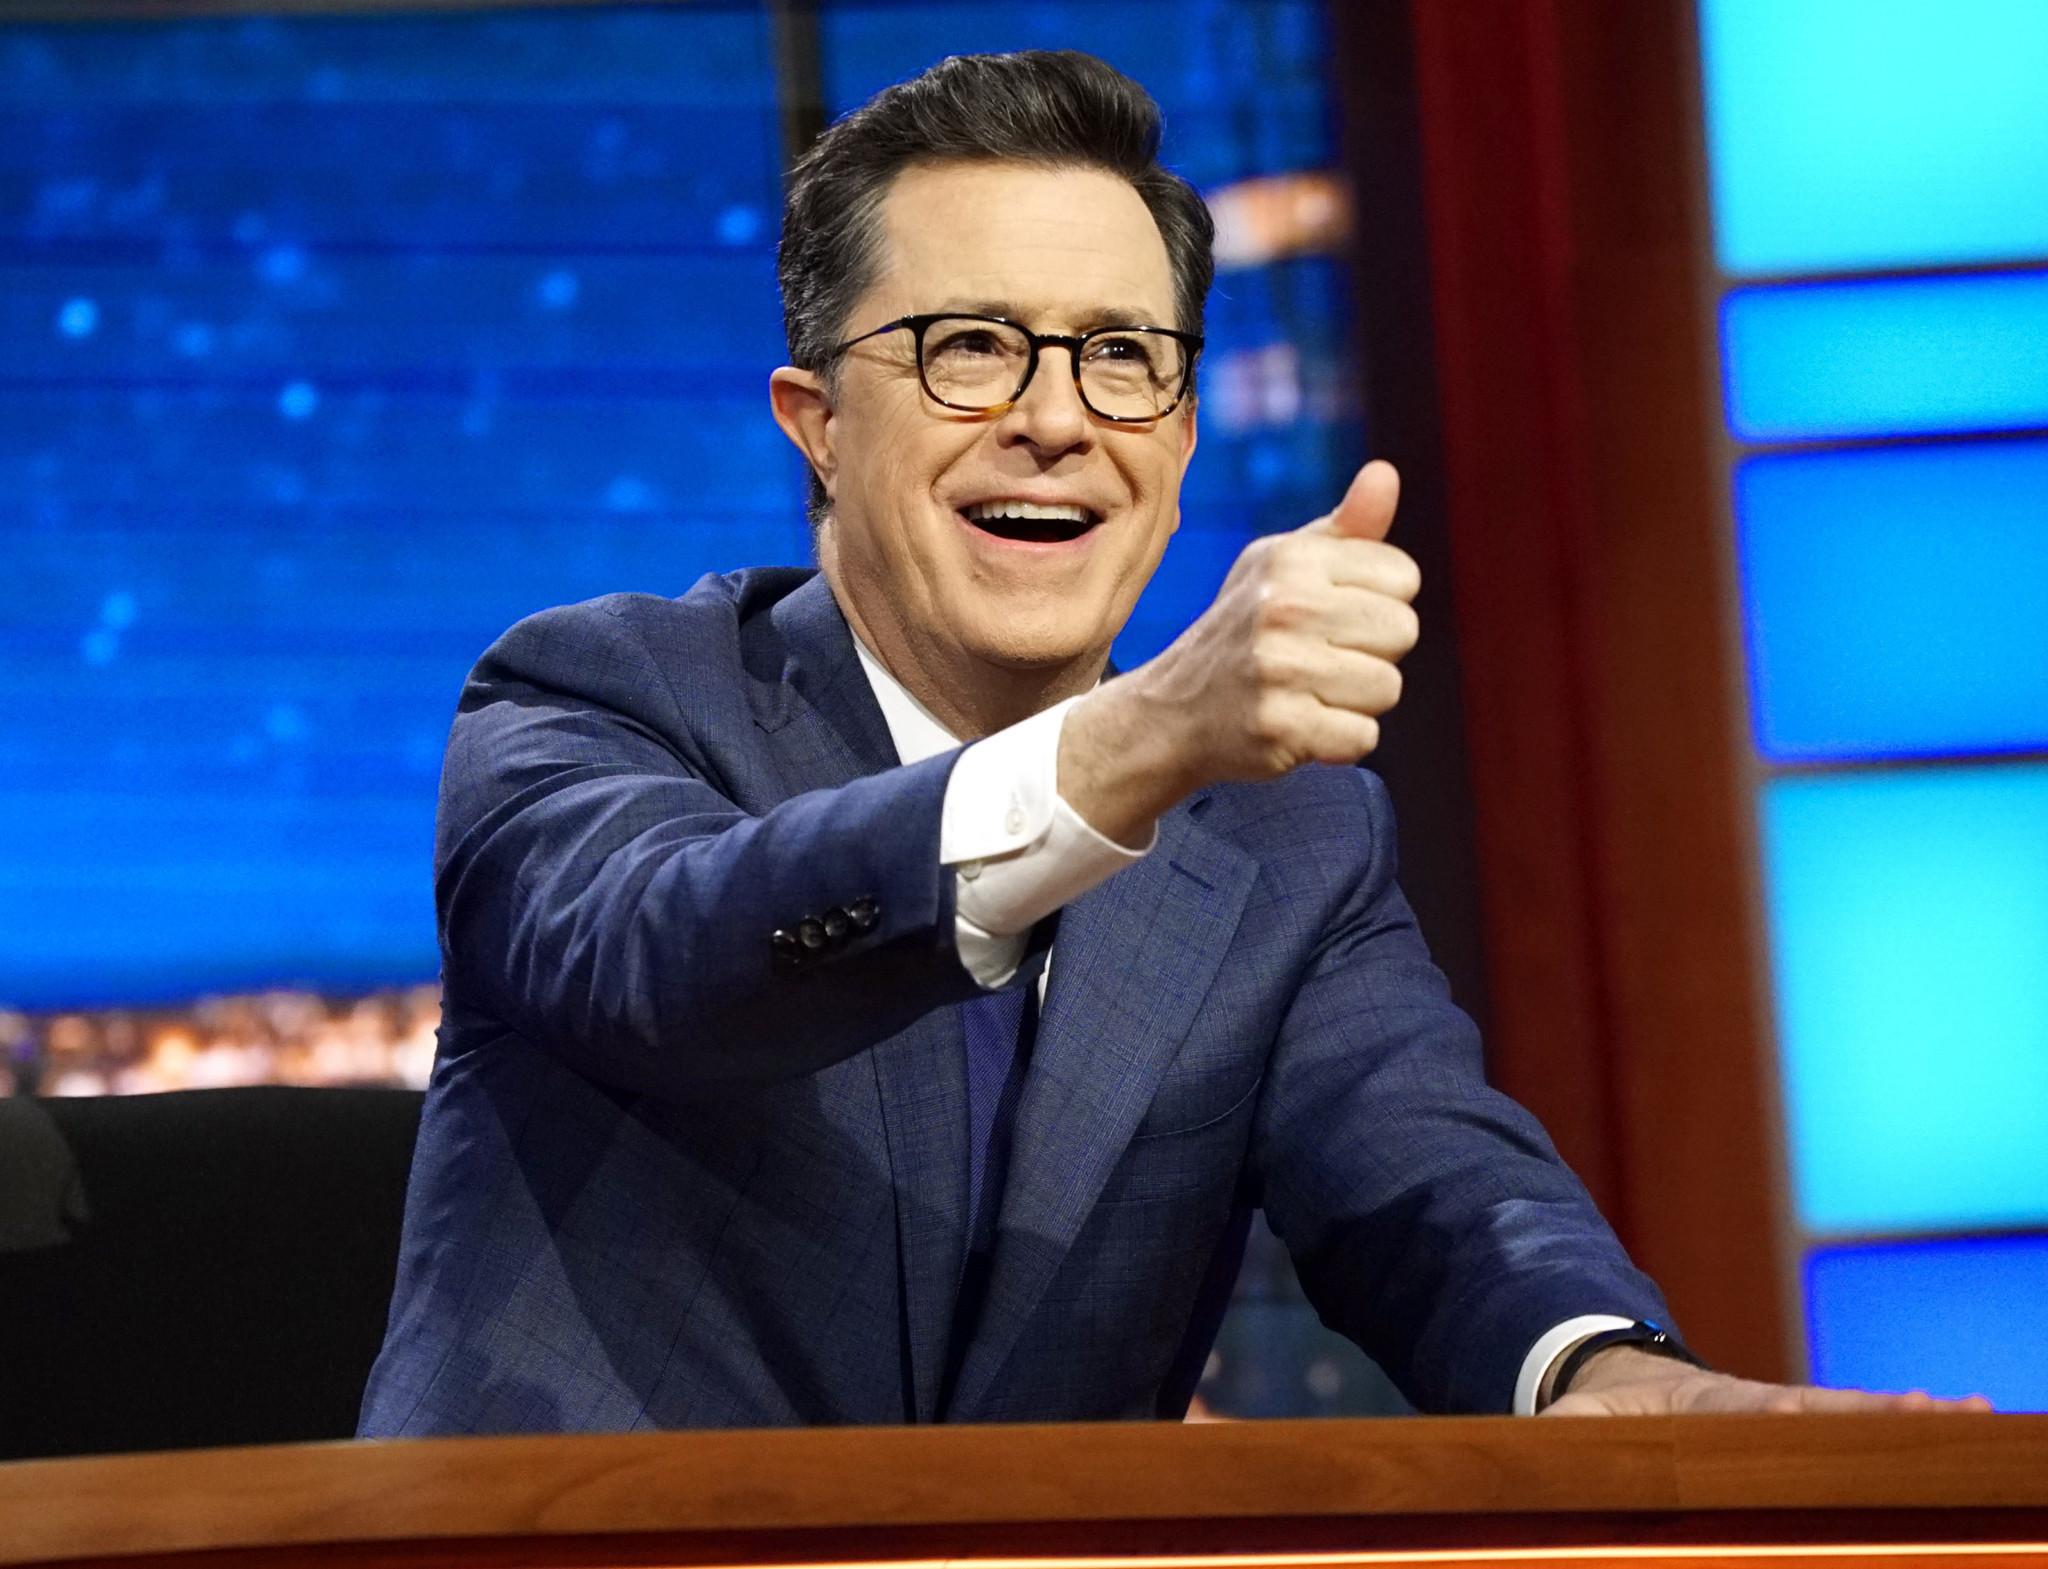 FCC: No punishment for late-night host Colbert's Trump joke